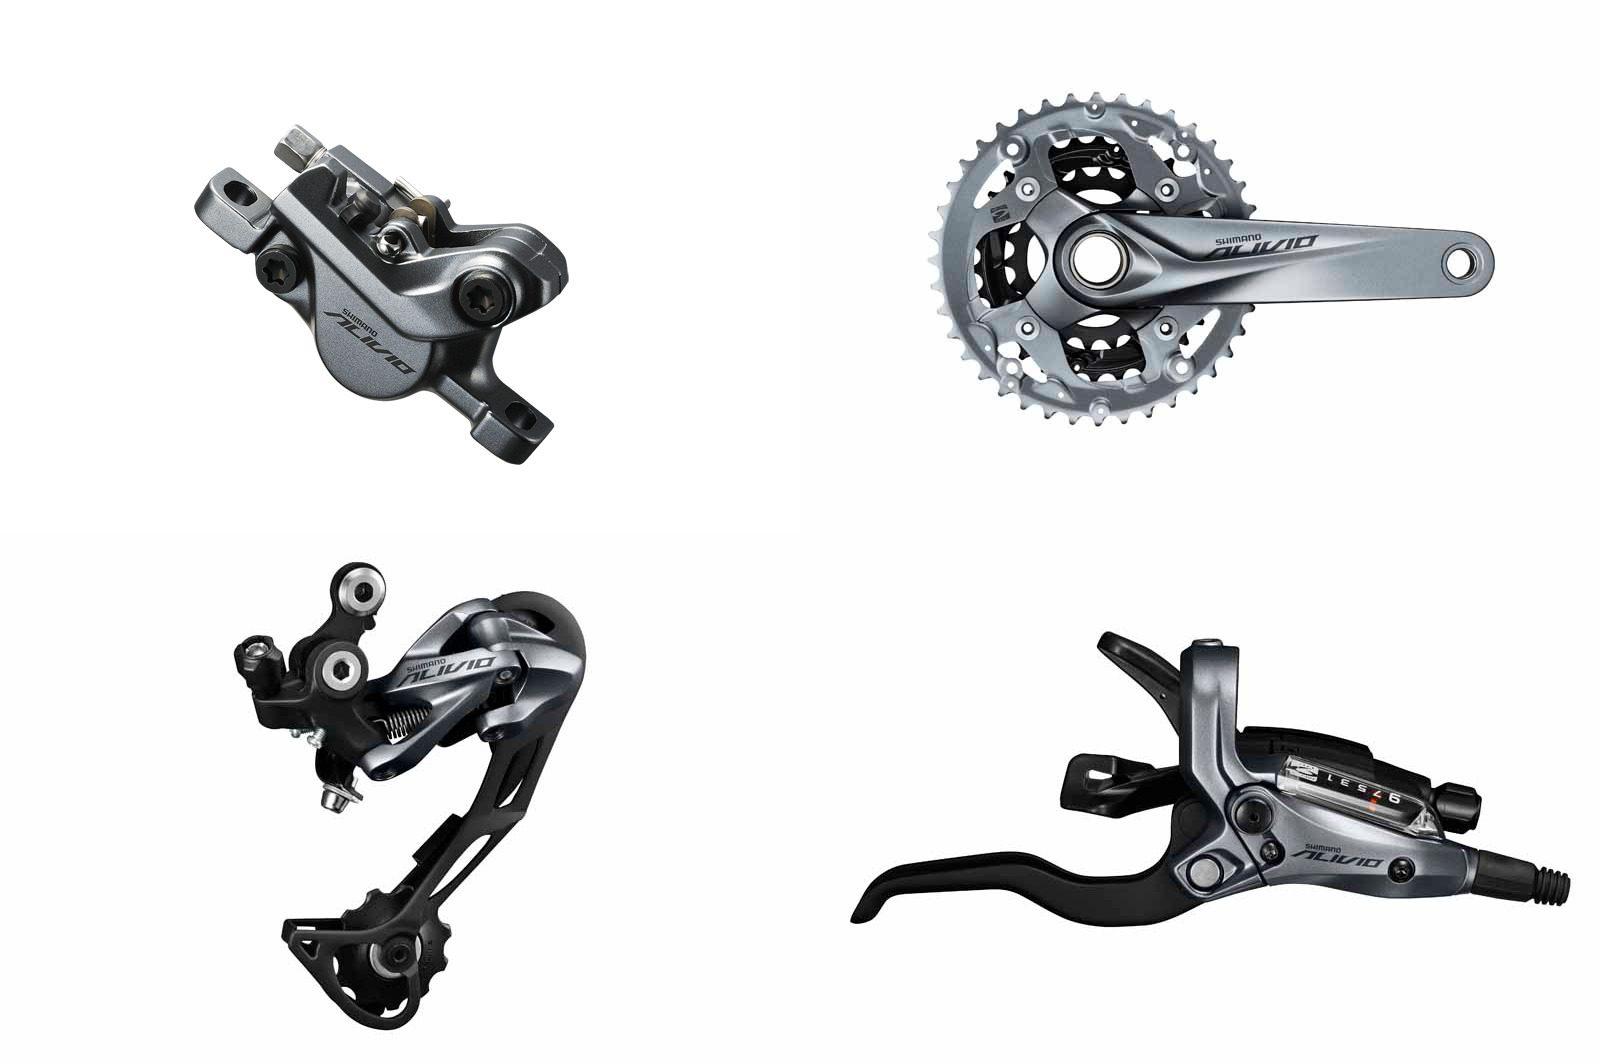 9 Speed MTB Mountain Bike Shadow Rear Derailleur for Shimano Alivio RD-M4000 AST